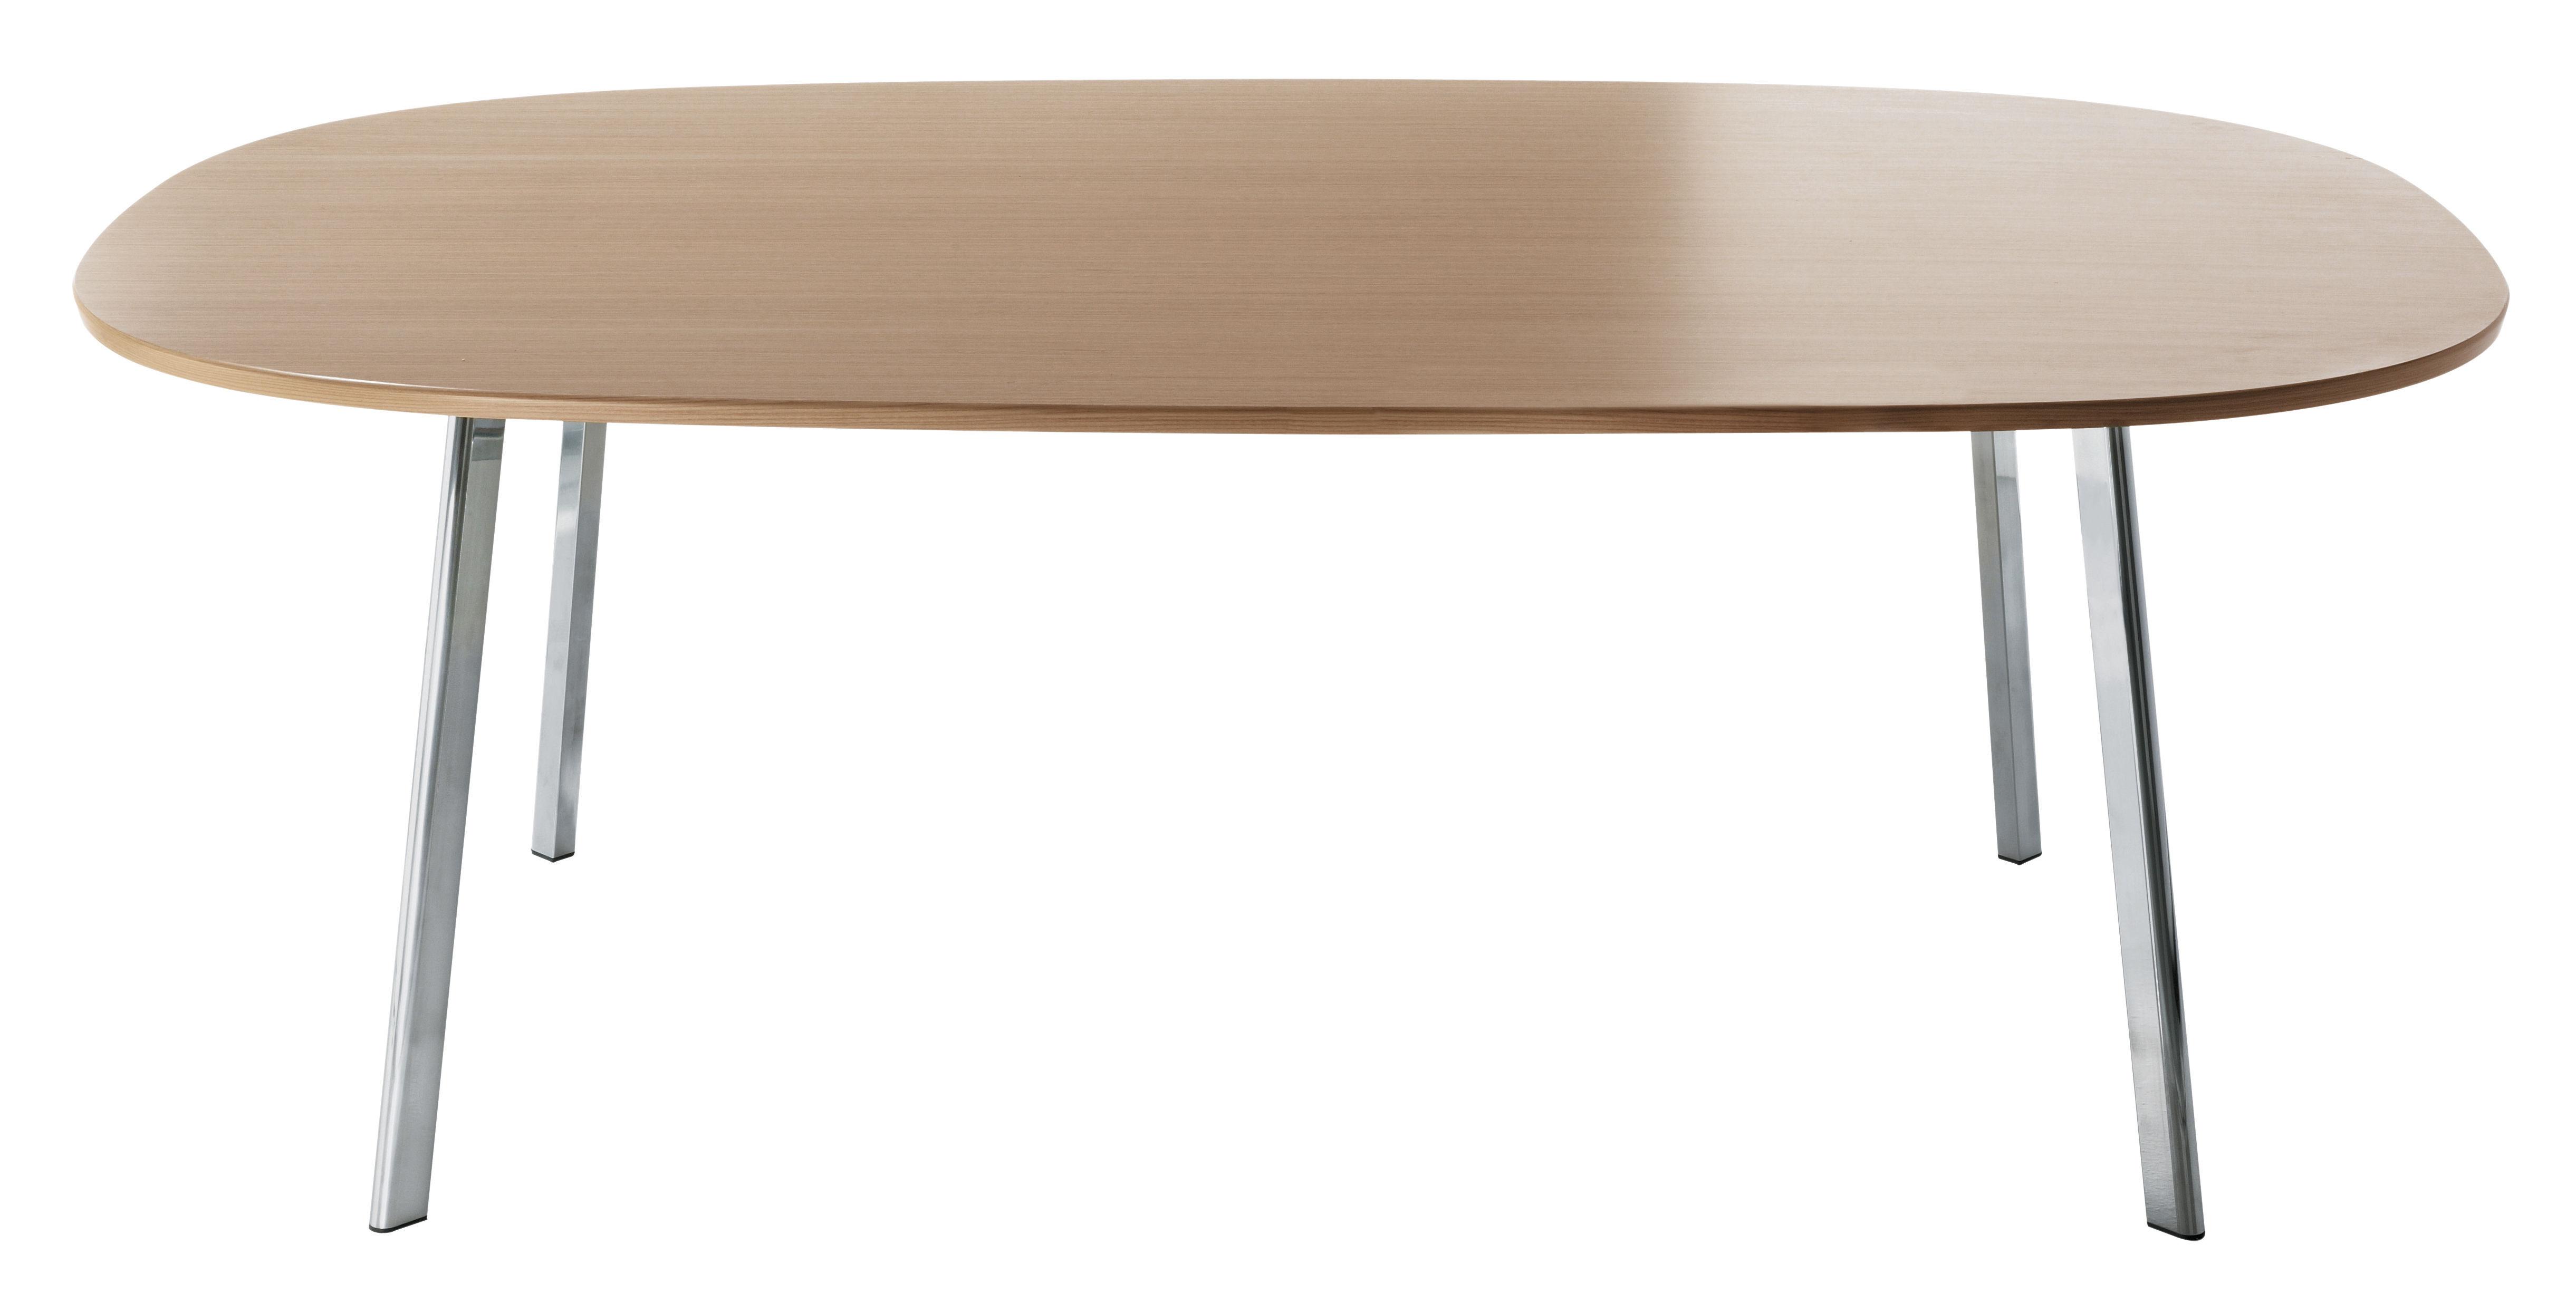 Furniture - Dining Tables - Déjà-vu Table - 124 cm by Magis - 124x124 - oak top - MDF veneer oak, Polished aluminium